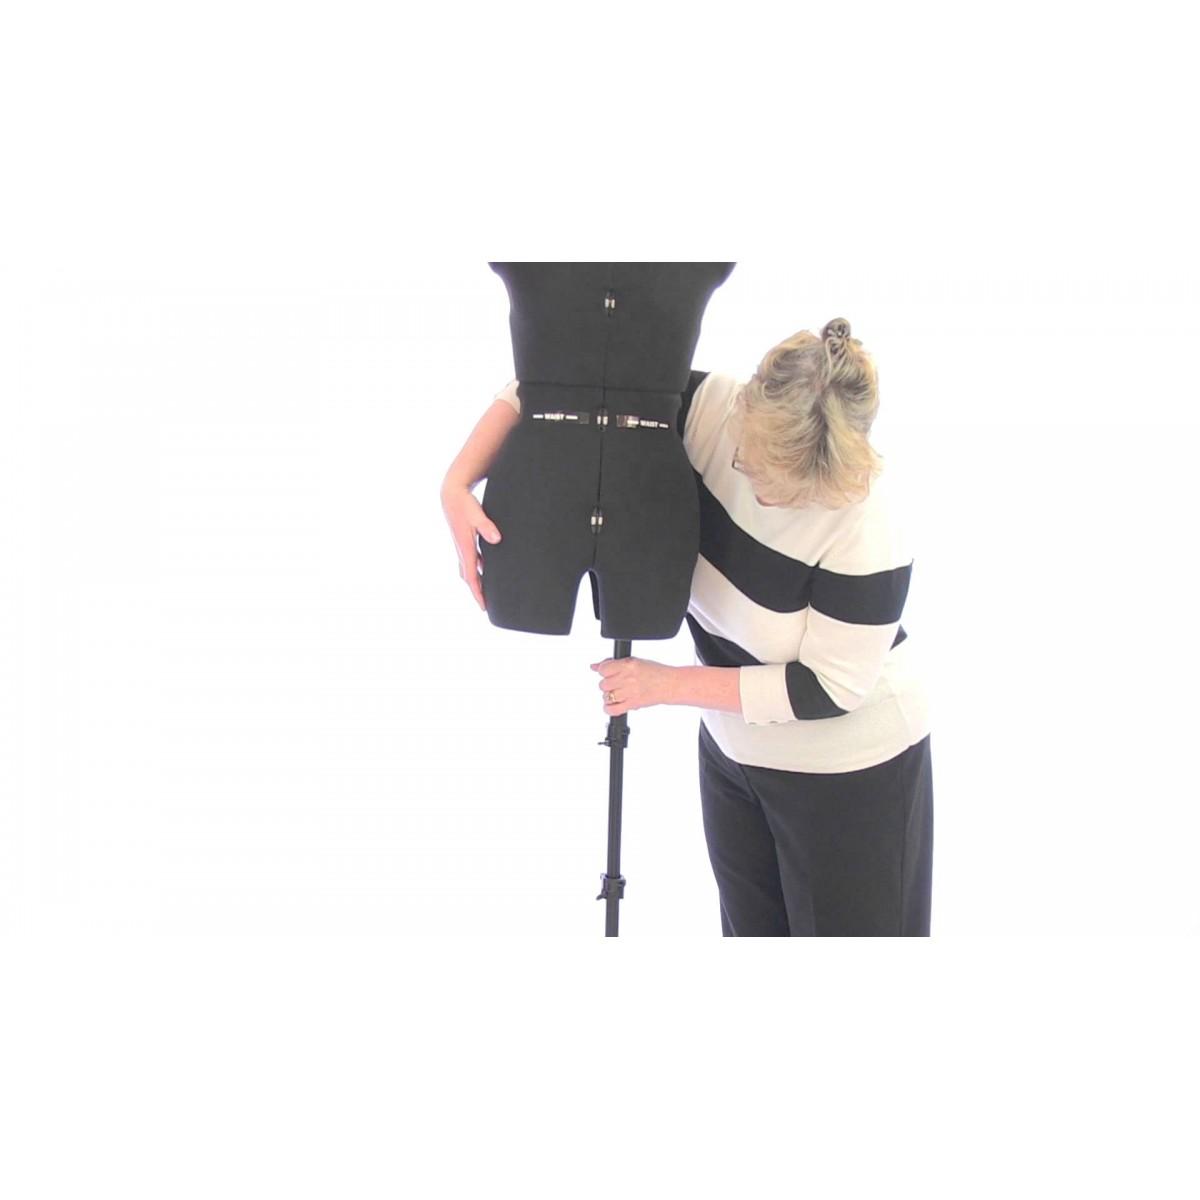 дамски малък за панталони - Sew Deluxe A